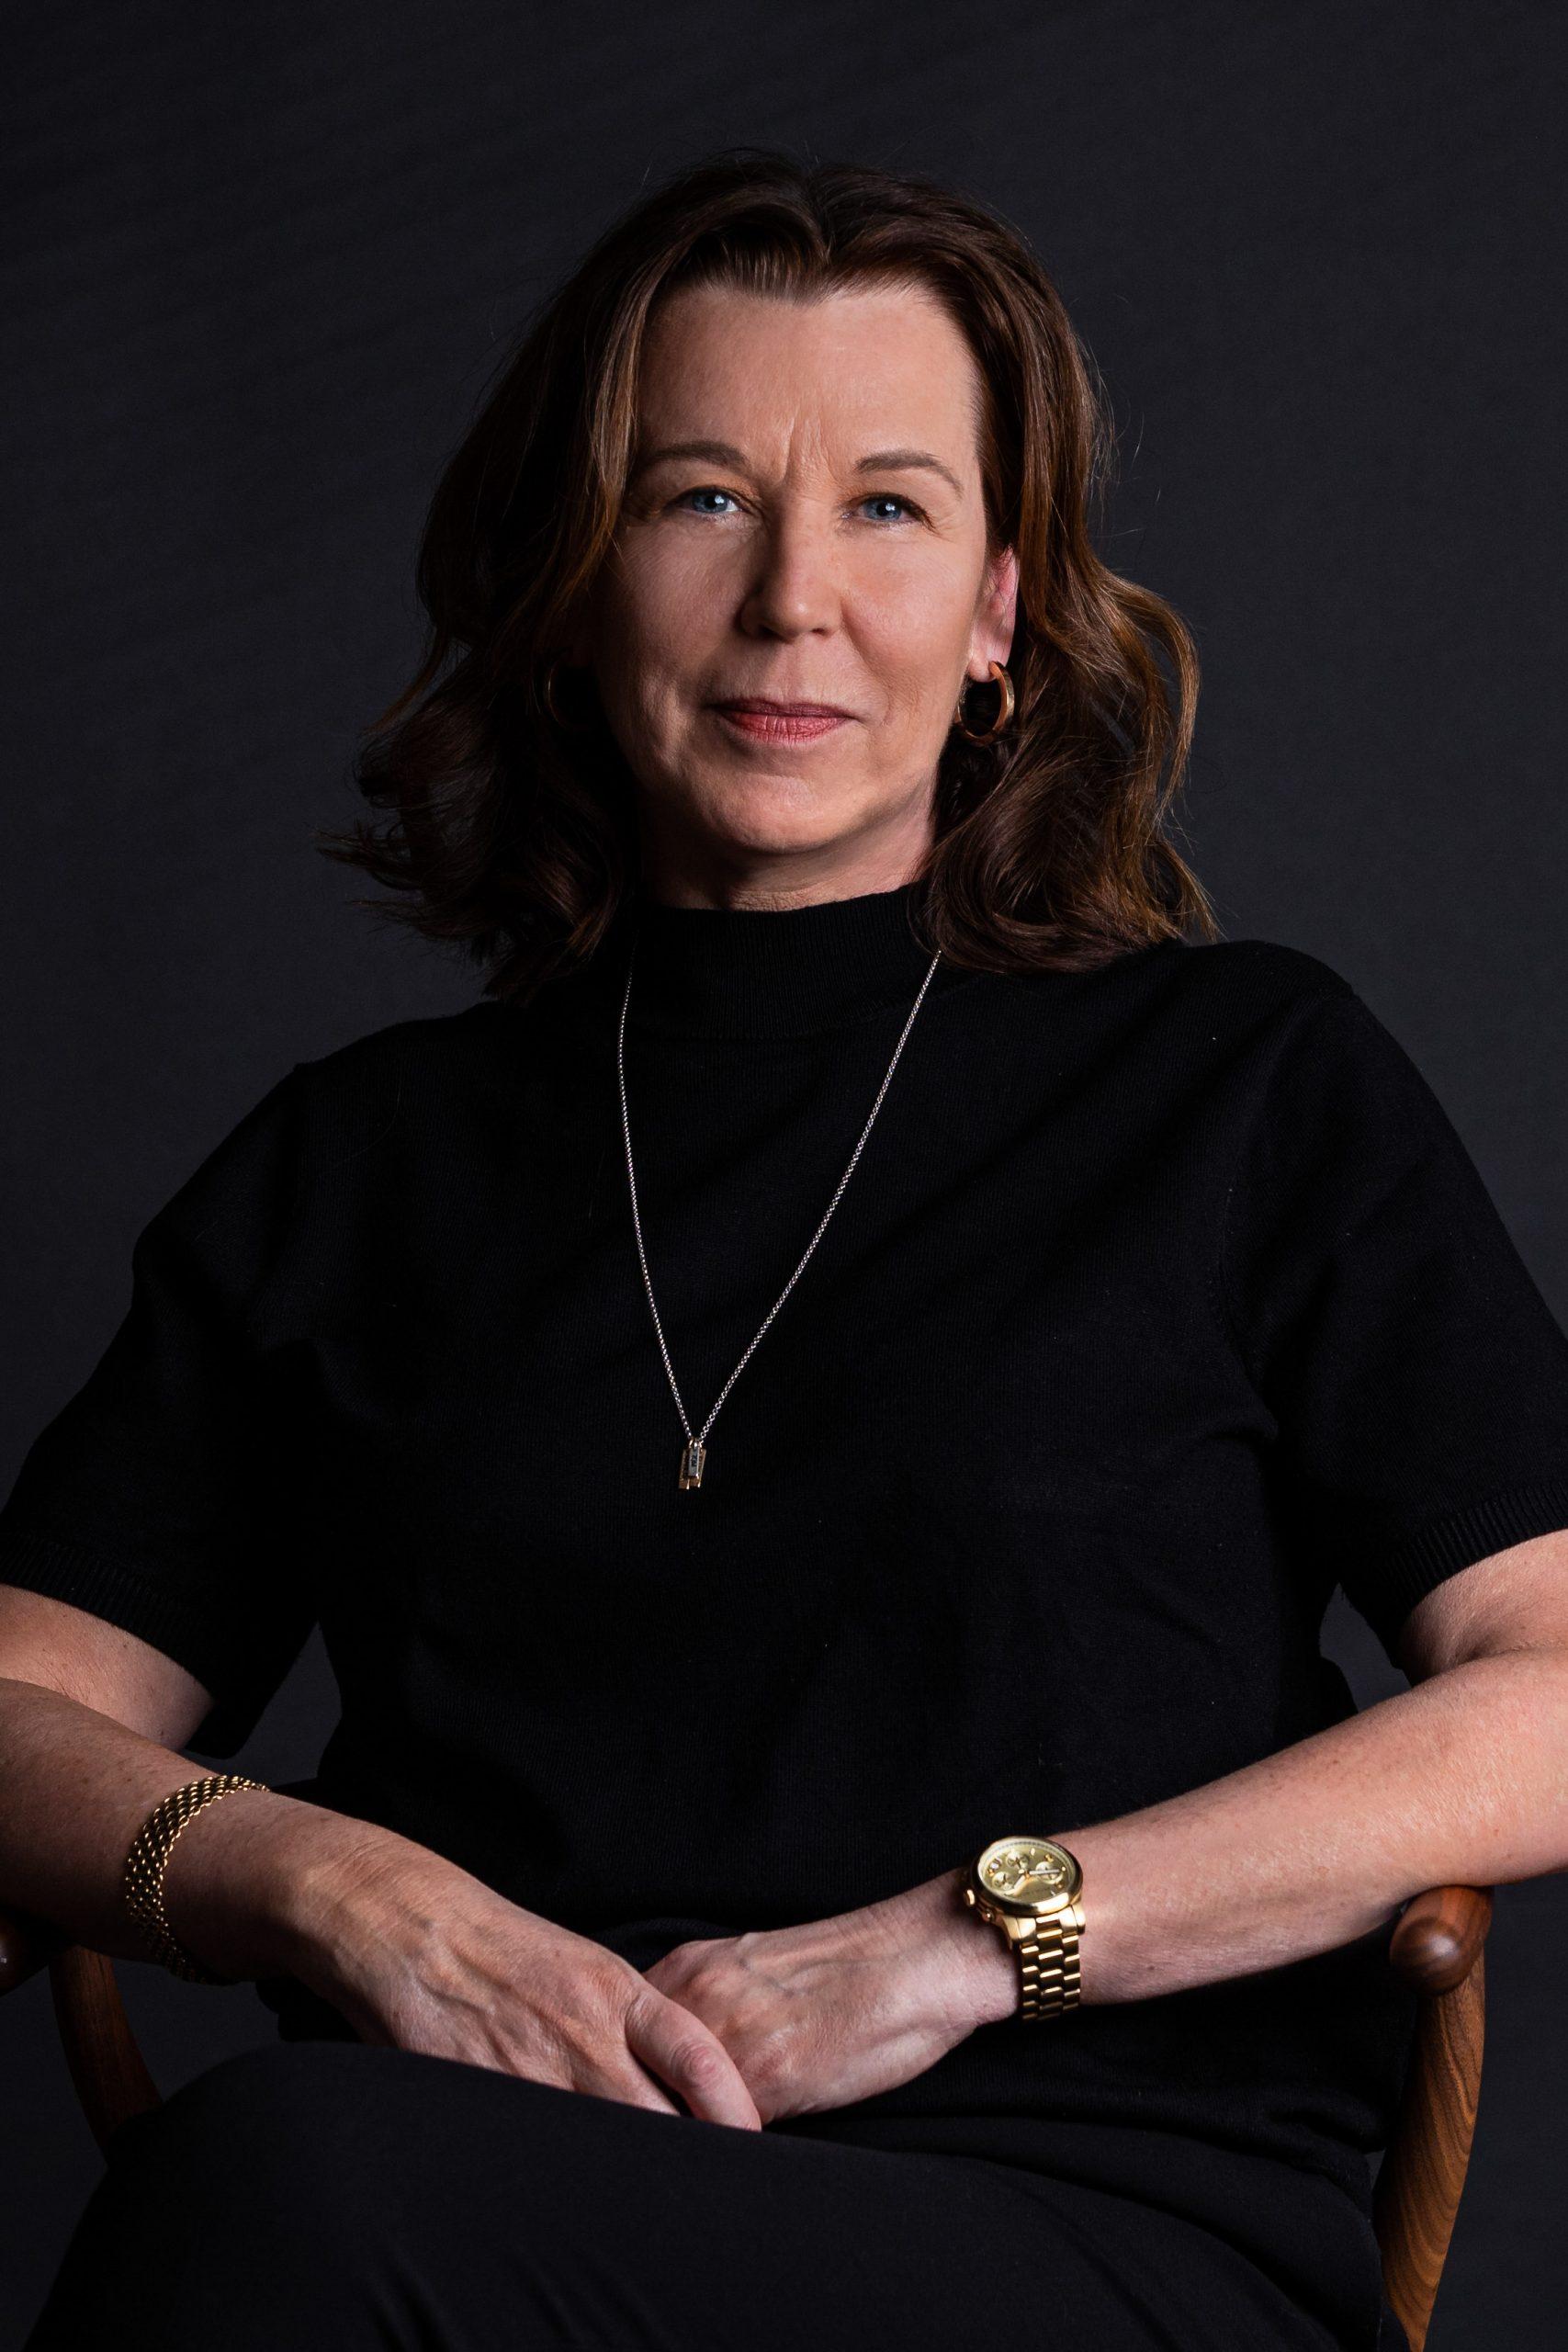 Susanne Berggren